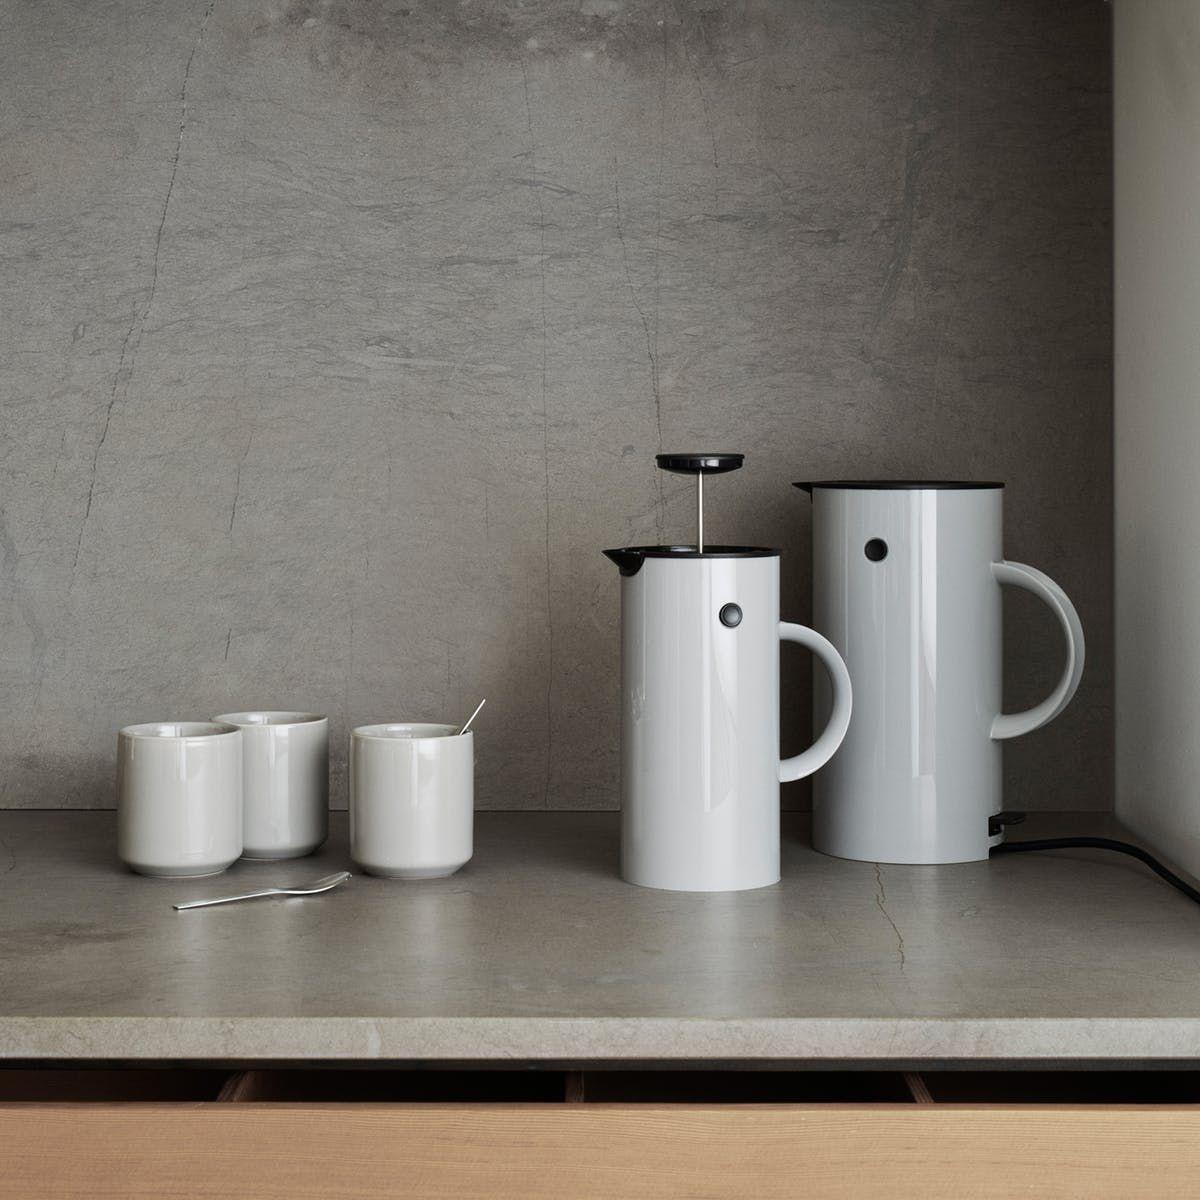 French Press Electric kettle, Stelton, Kettle